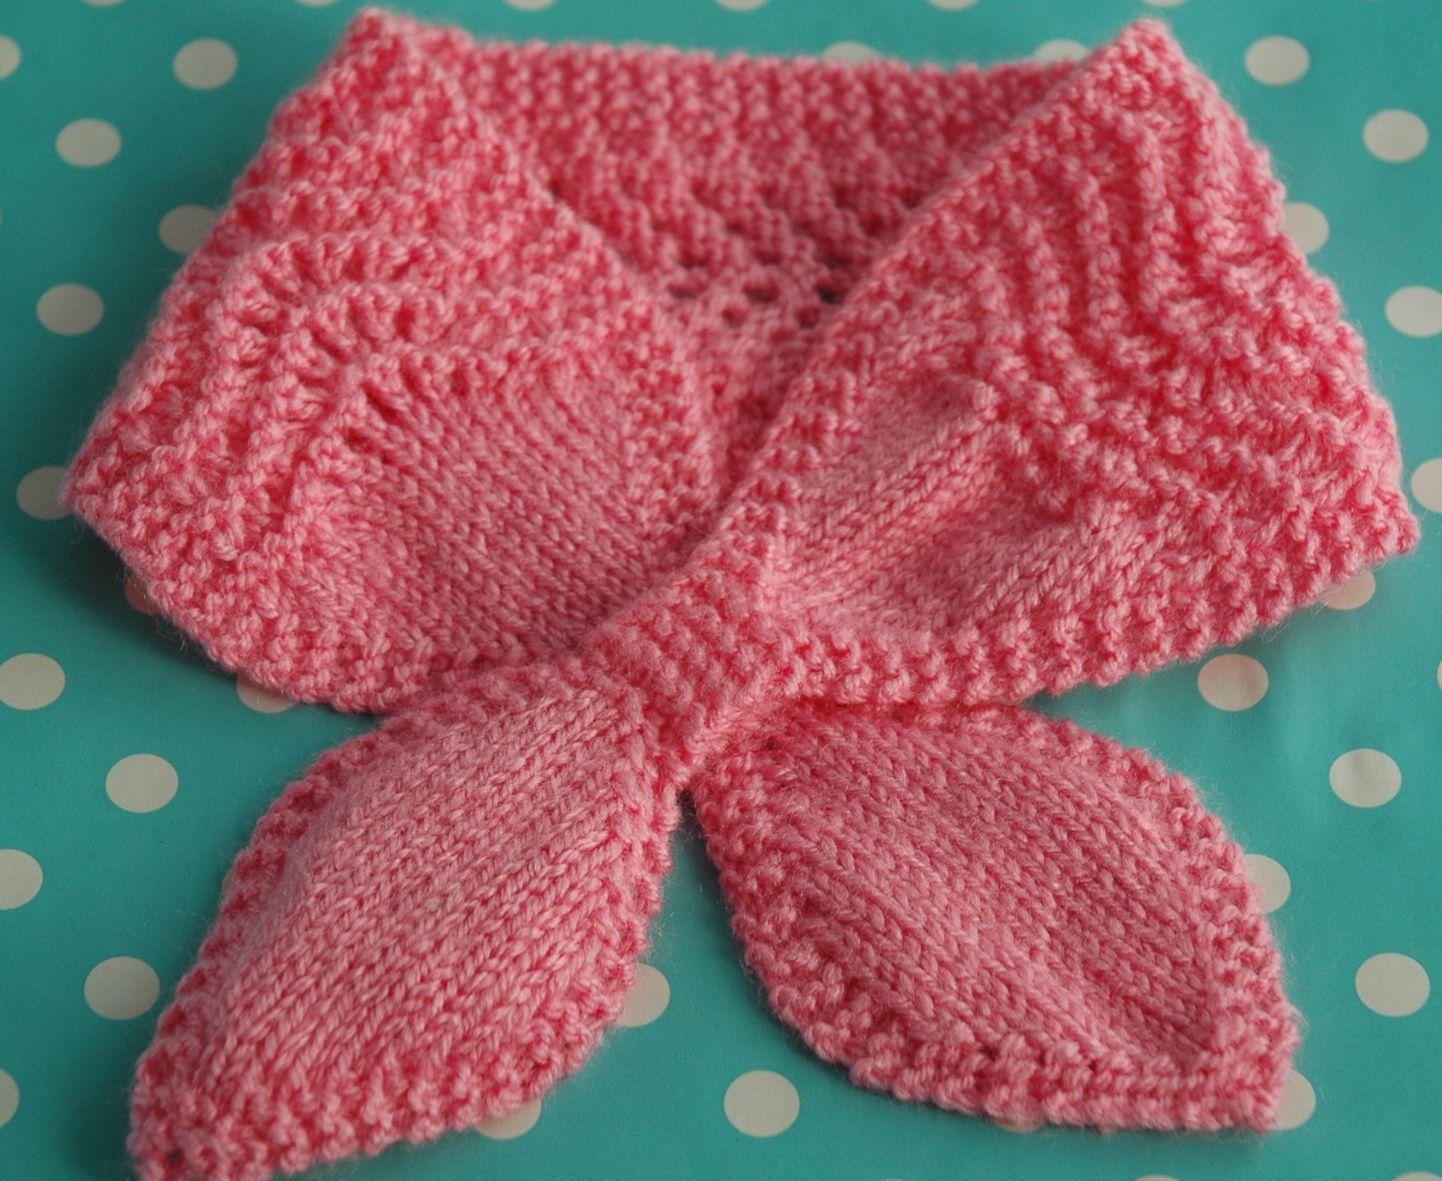 Lacy dog scarf knitting pattern | Κασκόλ με βελόνες | Pinterest ...